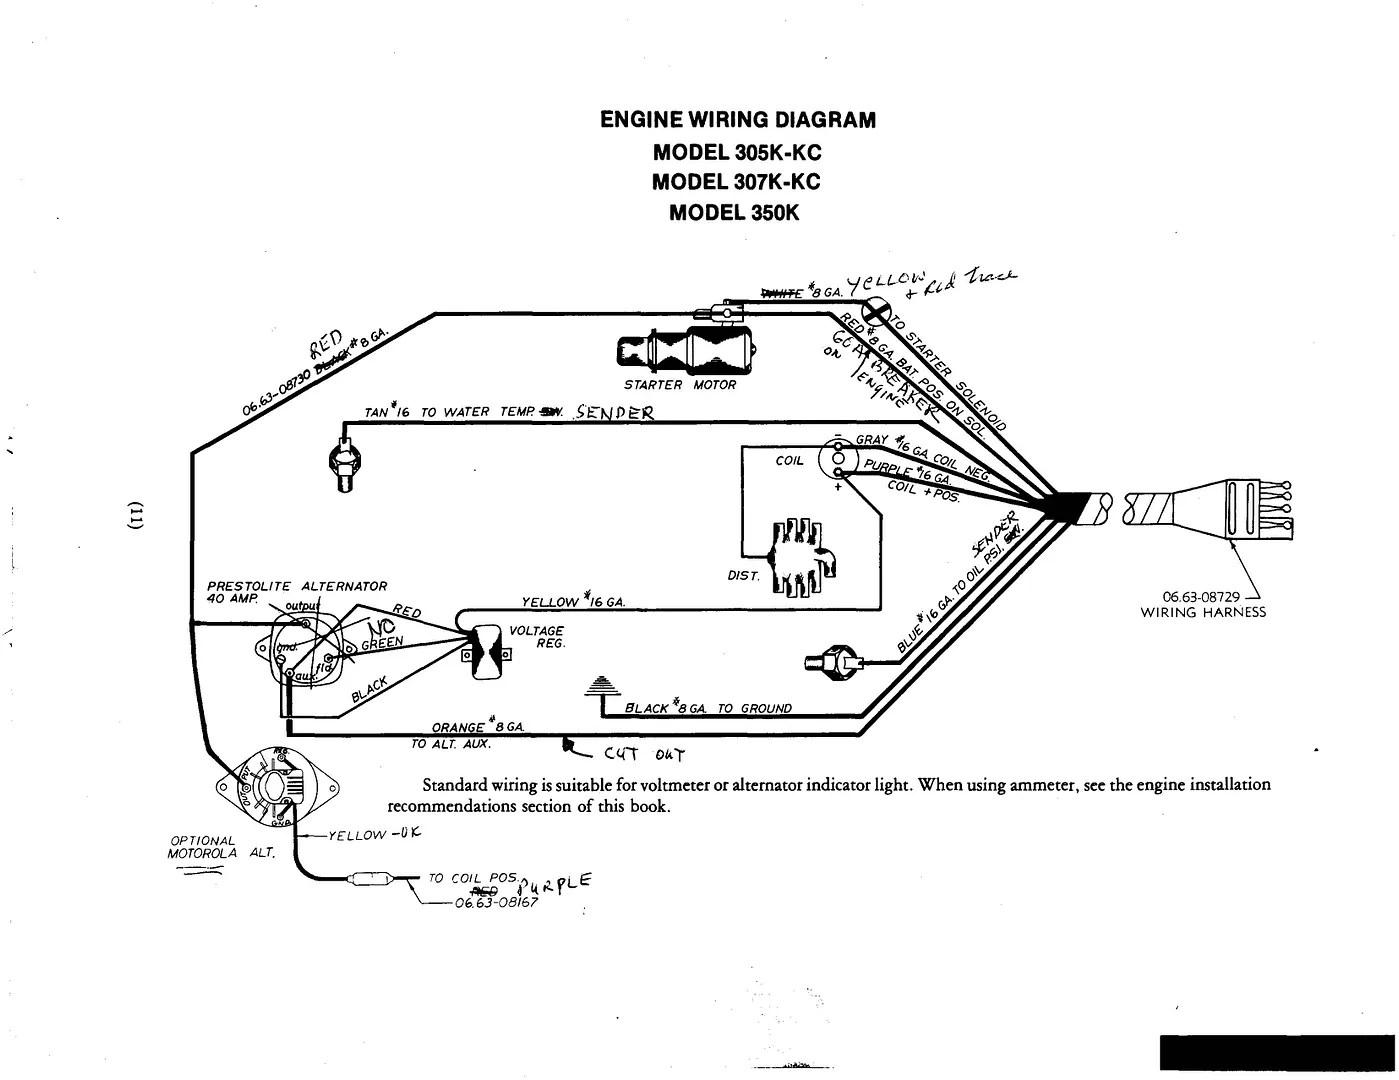 1986 toyota mr2 wiring diagram left side brain functions fuse box alfa romeo spider auto